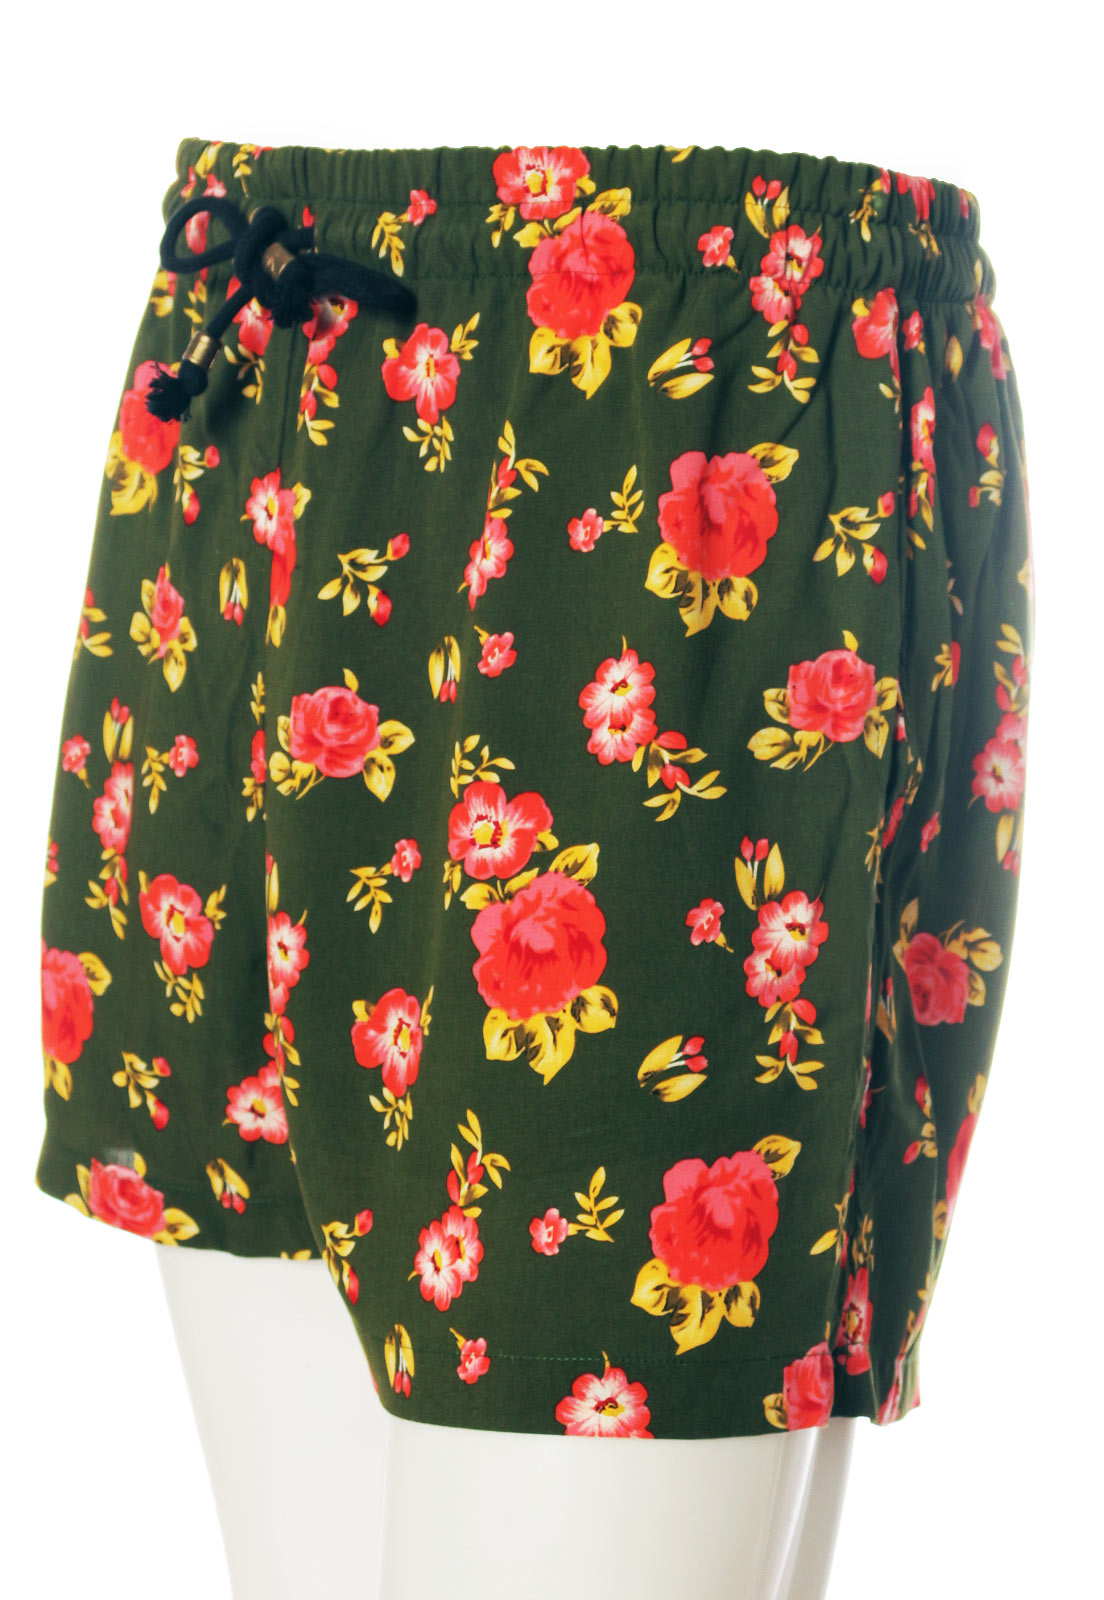 Shorts Floral Estampado Lácio Roma ElephunK Sem Gênero Verde